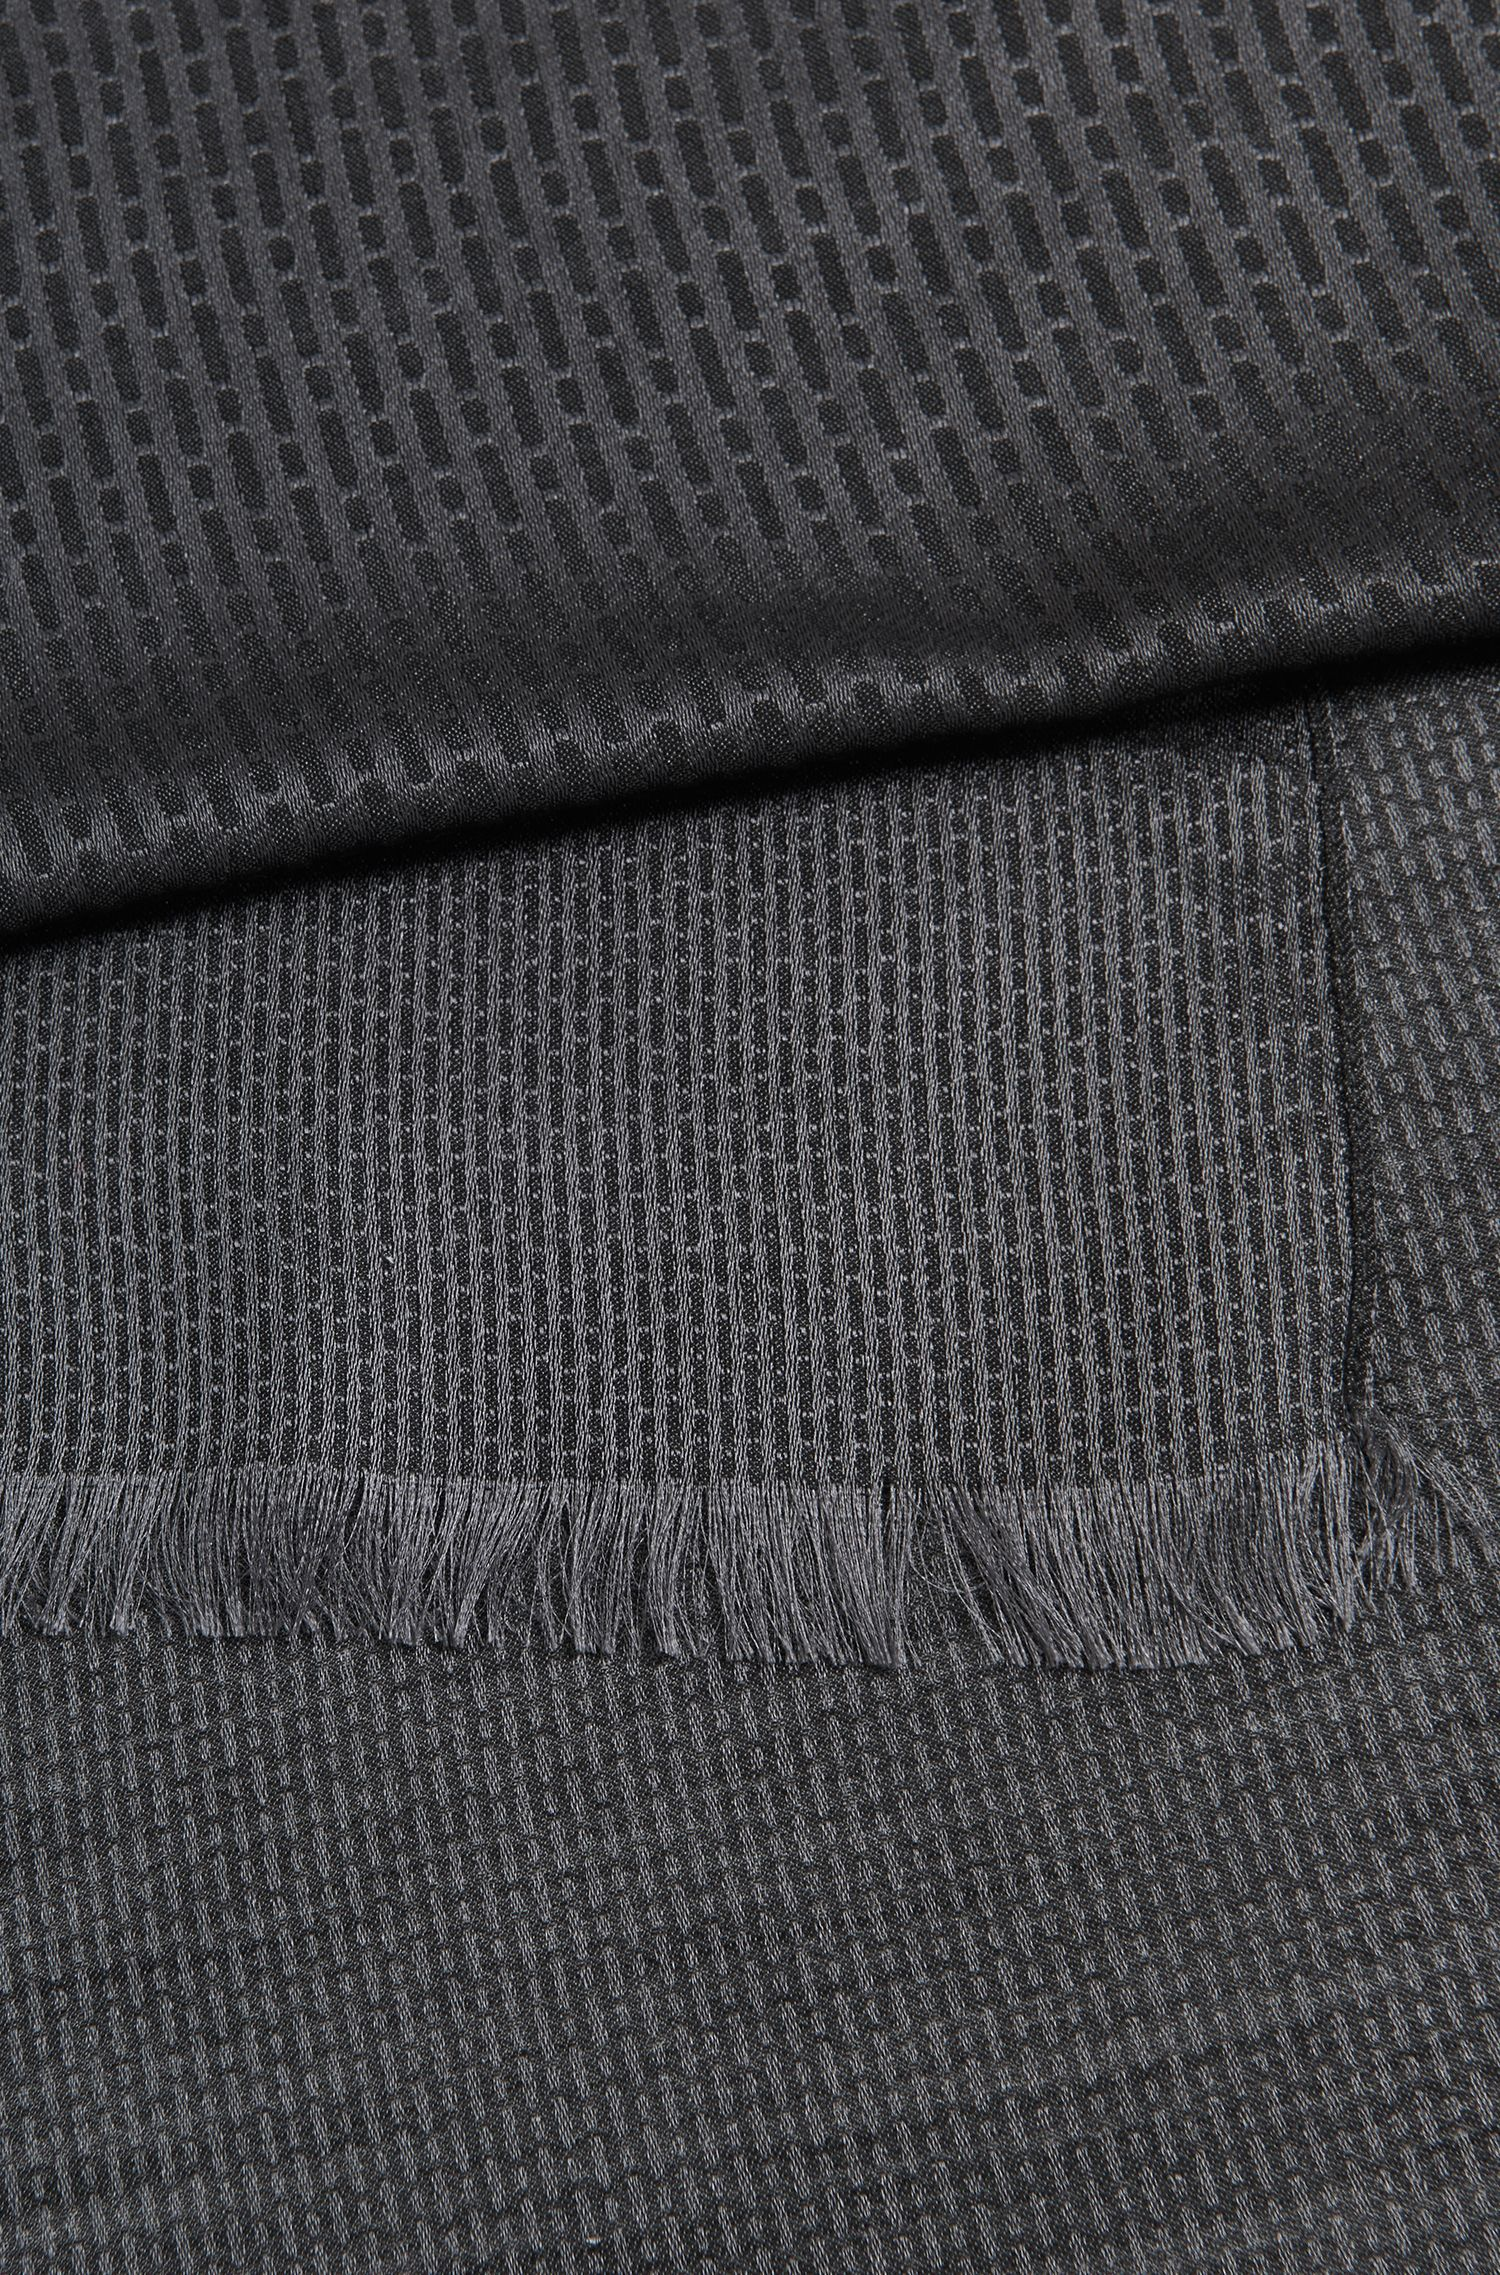 Bufanda de la colección Mercedes-Benz de jacquard en mezcla de lana virgen ligera